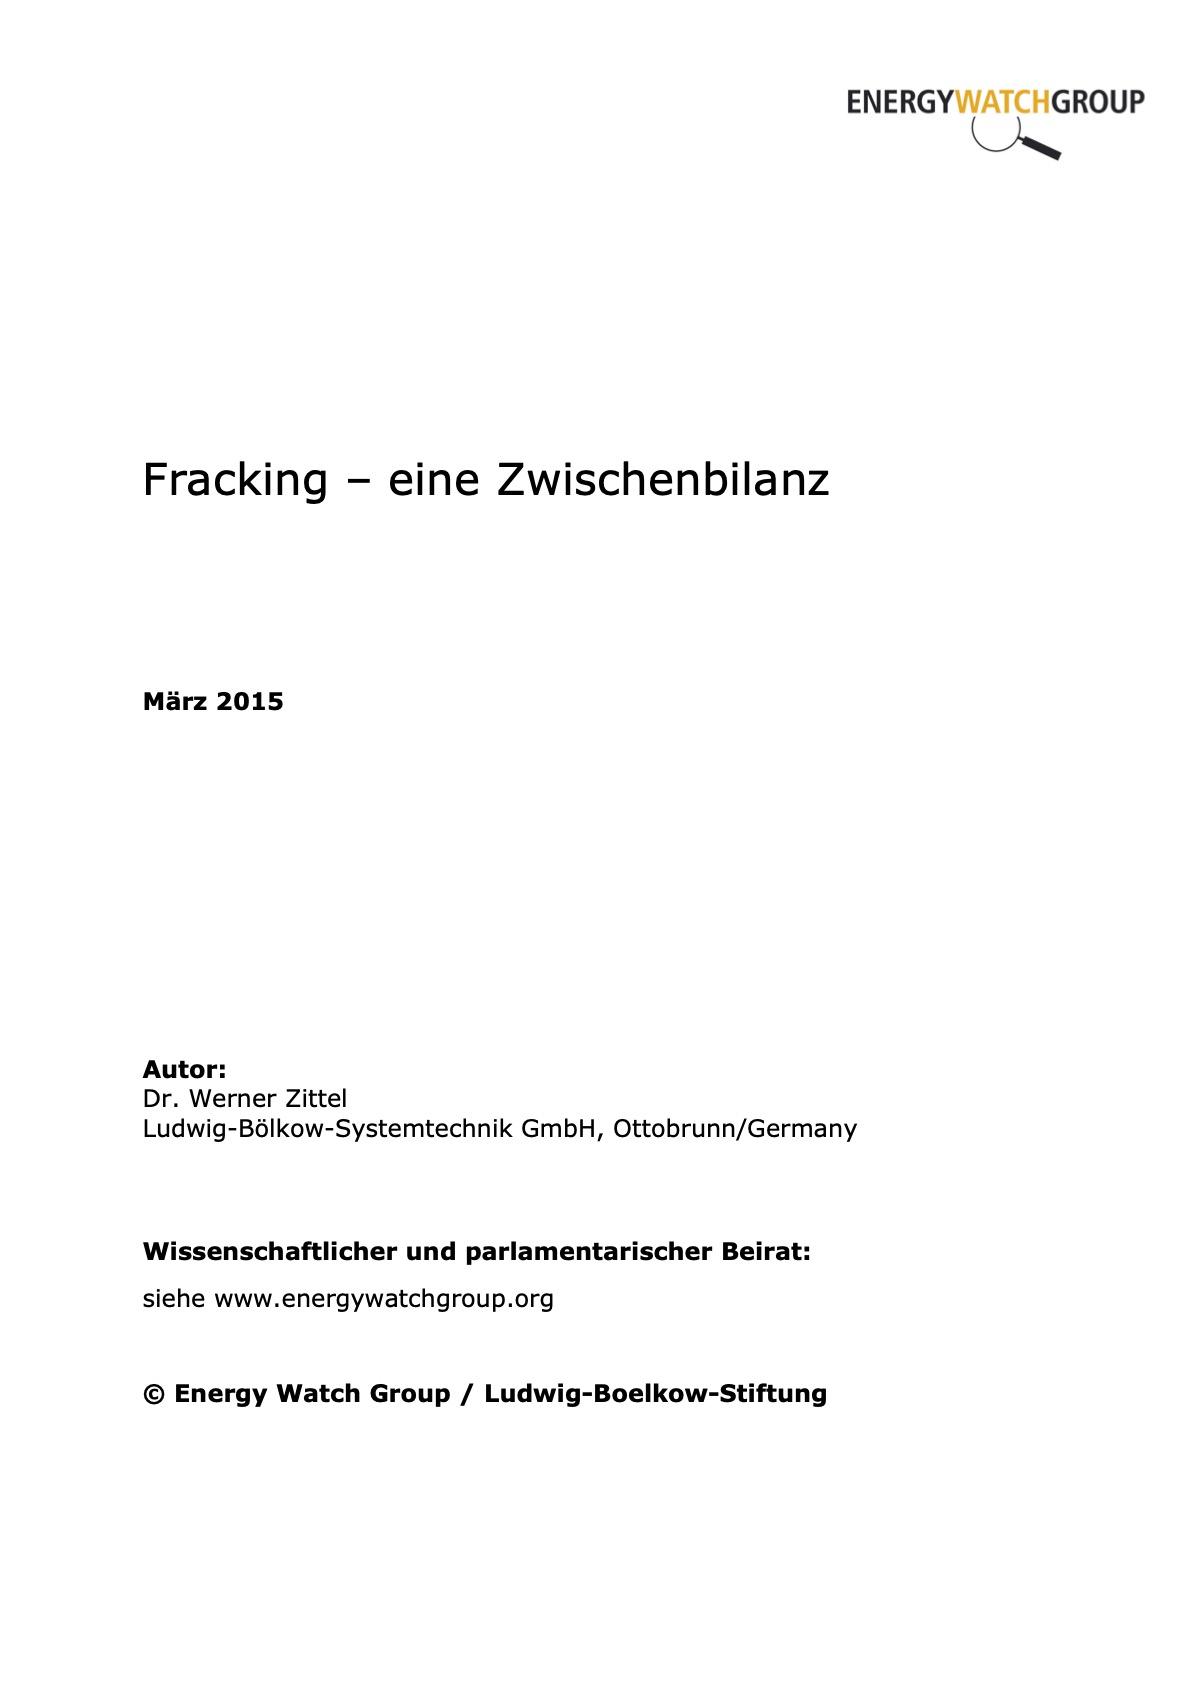 EWG-Fracking_2015.pdfs_